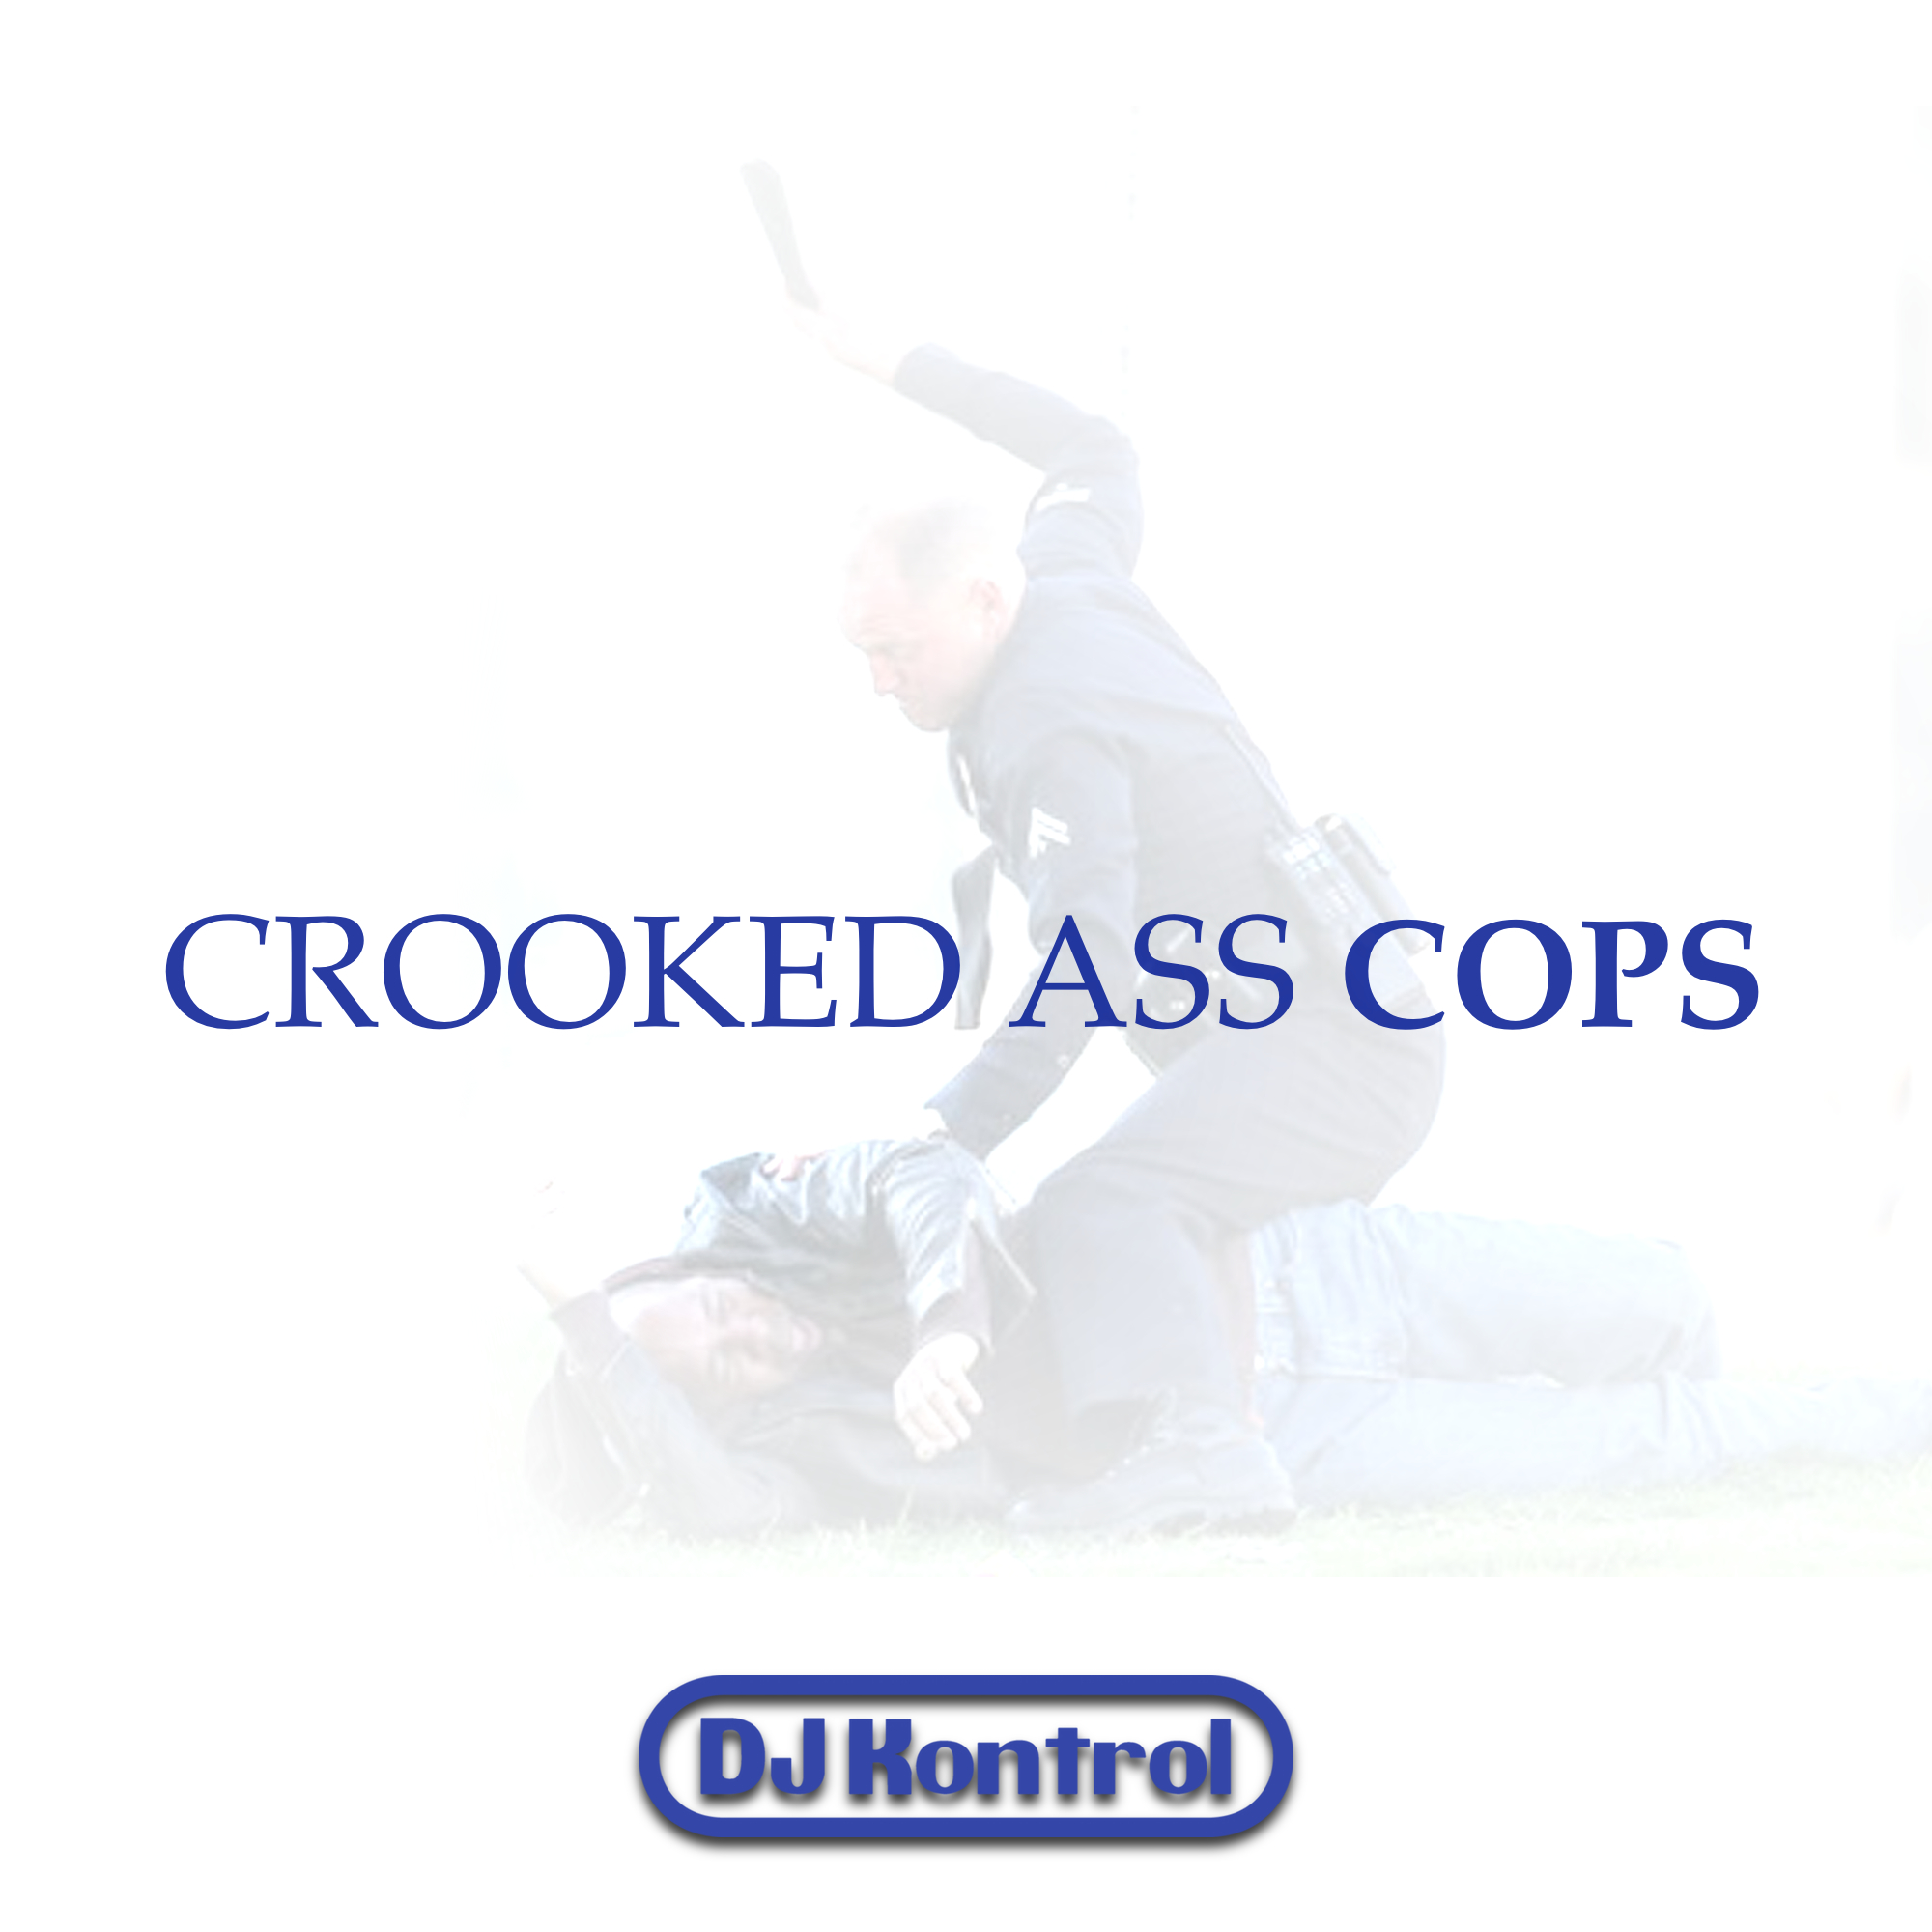 DJ Kontrol - Crooked Ass Cops